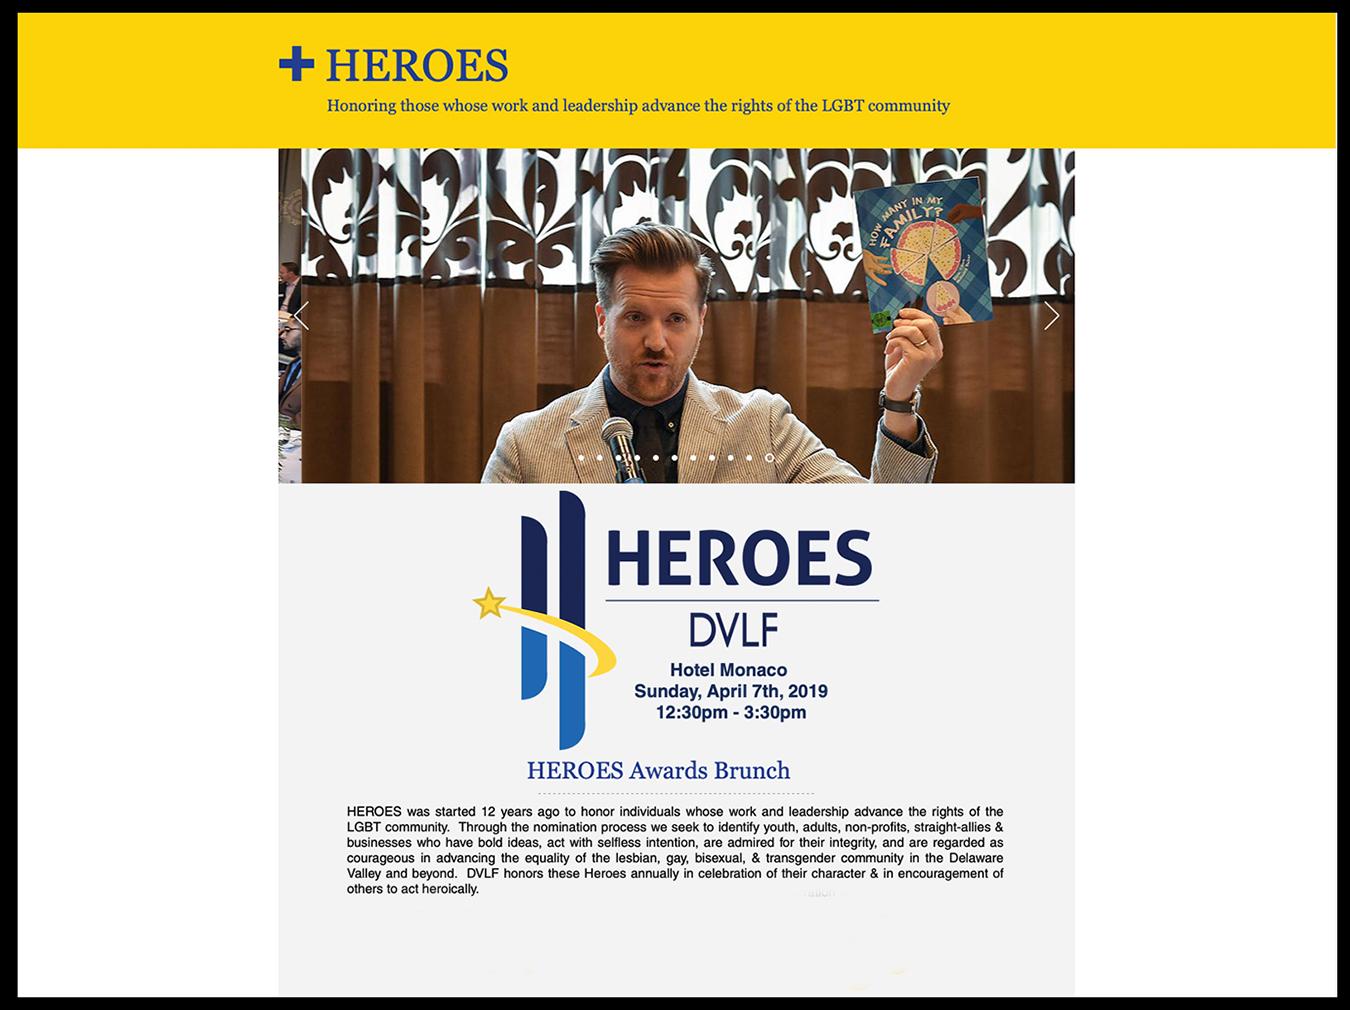 Heroes Awards Brunch: Hotel Monaco, April 7, 2019